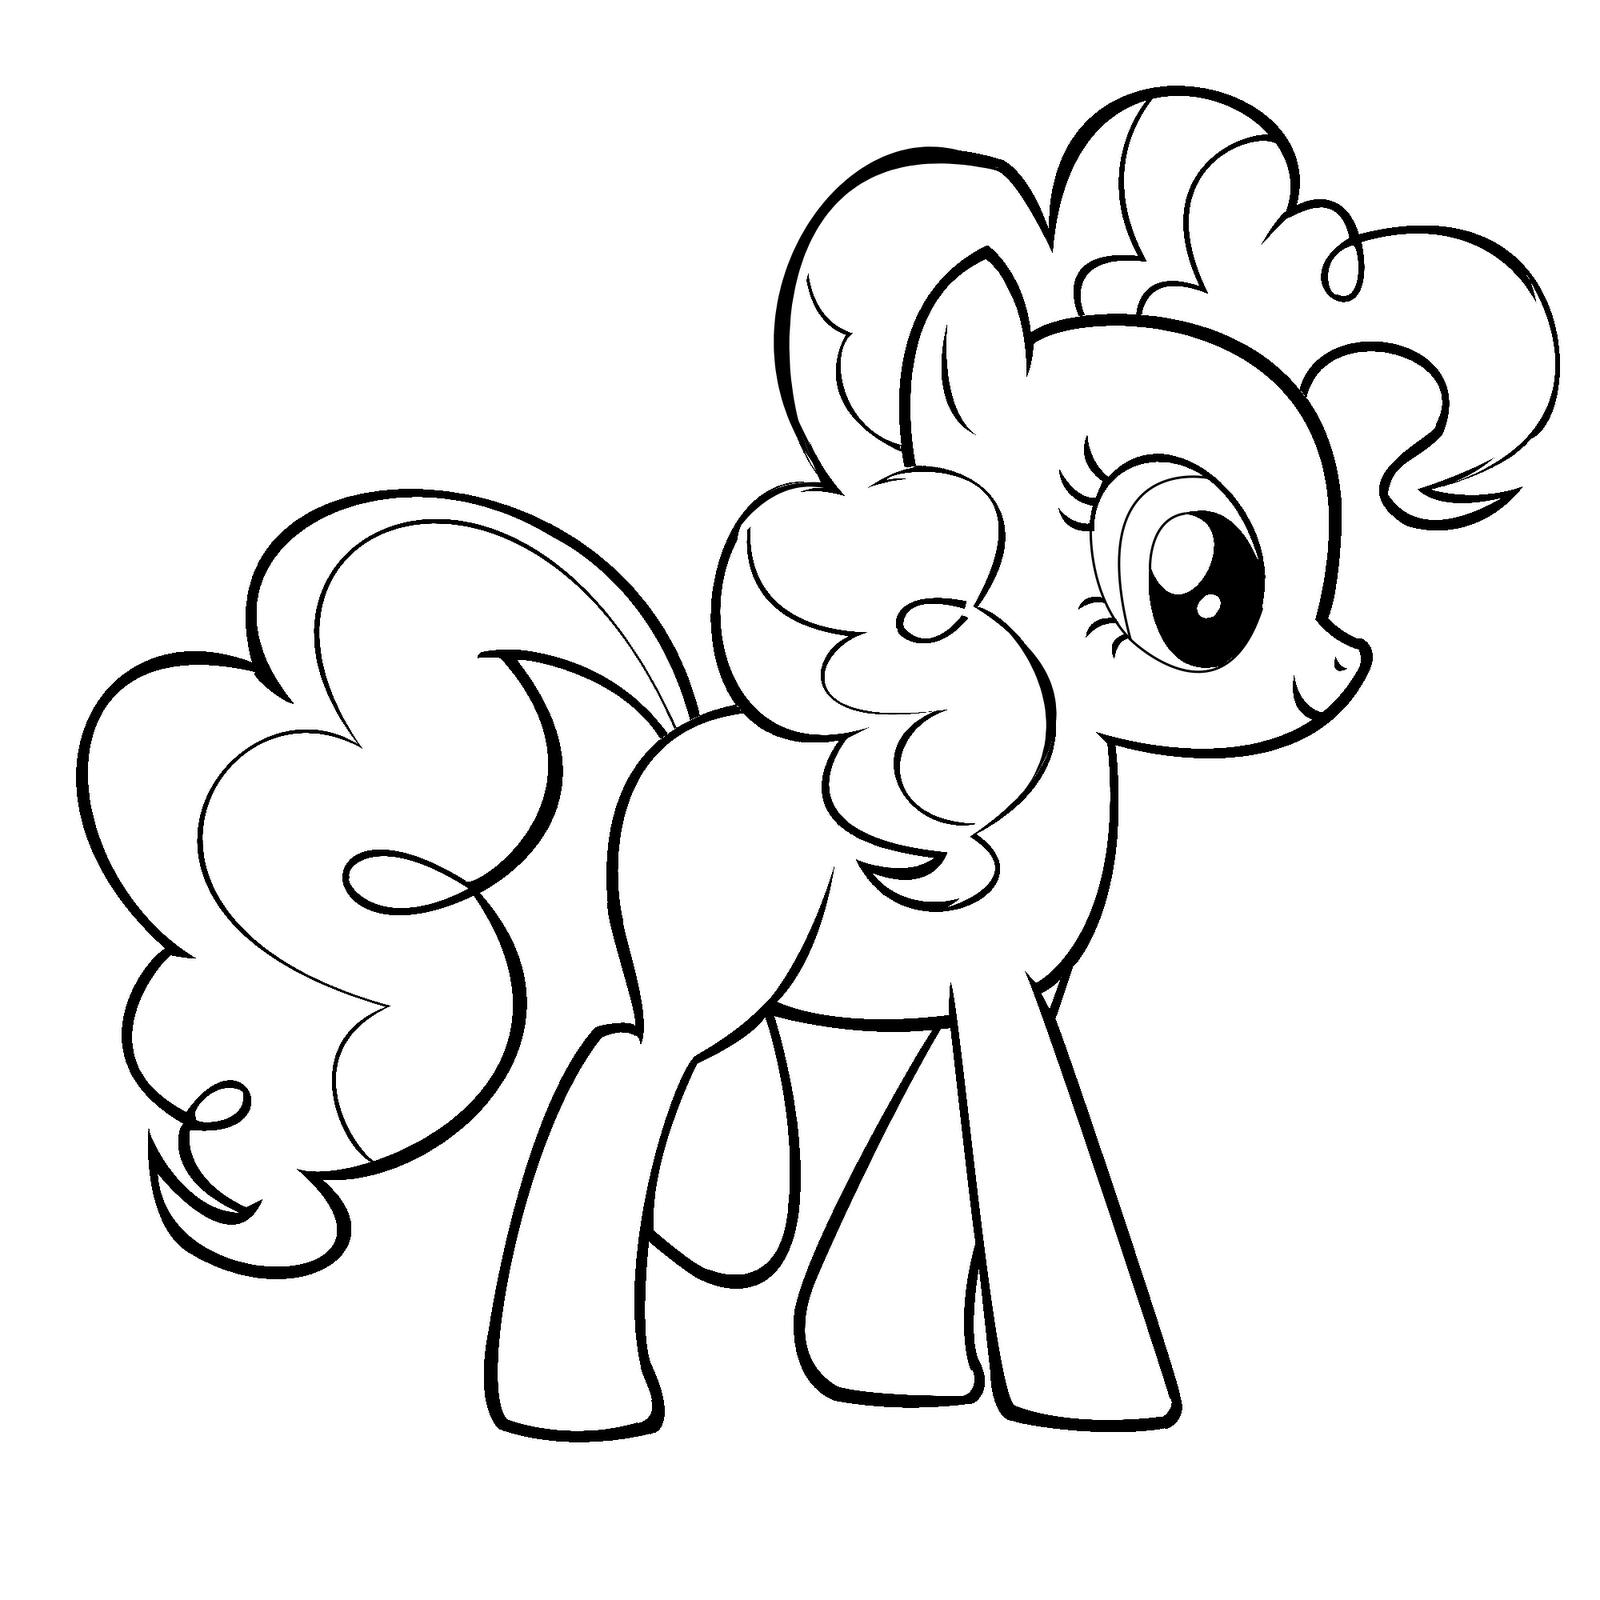 mlp printouts my little pony coloring pages getcoloringpagescom mlp printouts